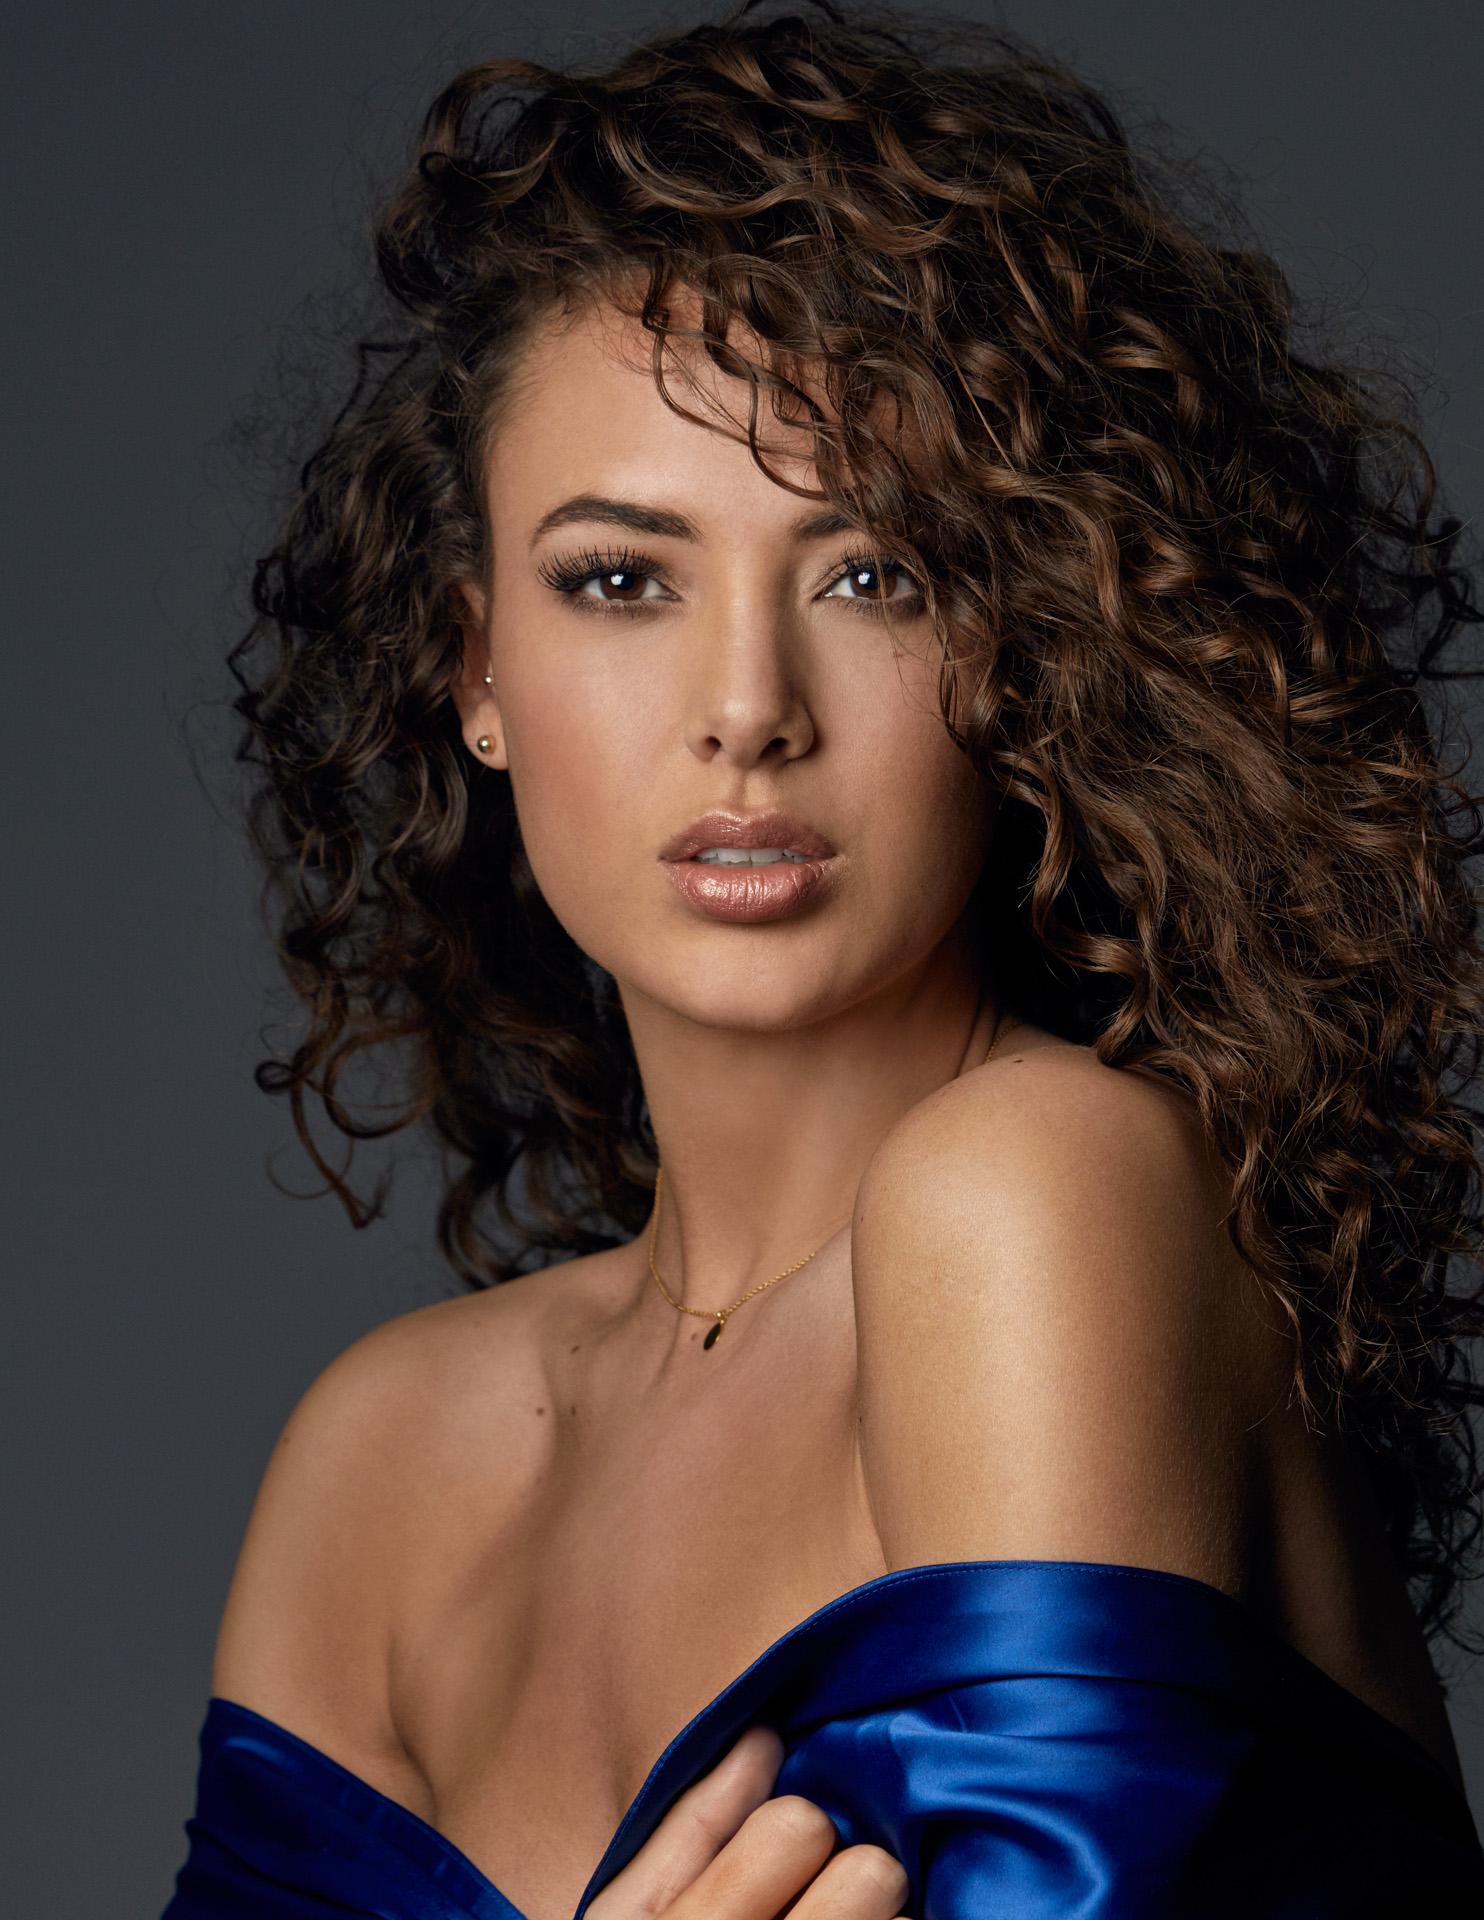 Miss Nederland - Miss Universe Netherlands - Zoey Ivory